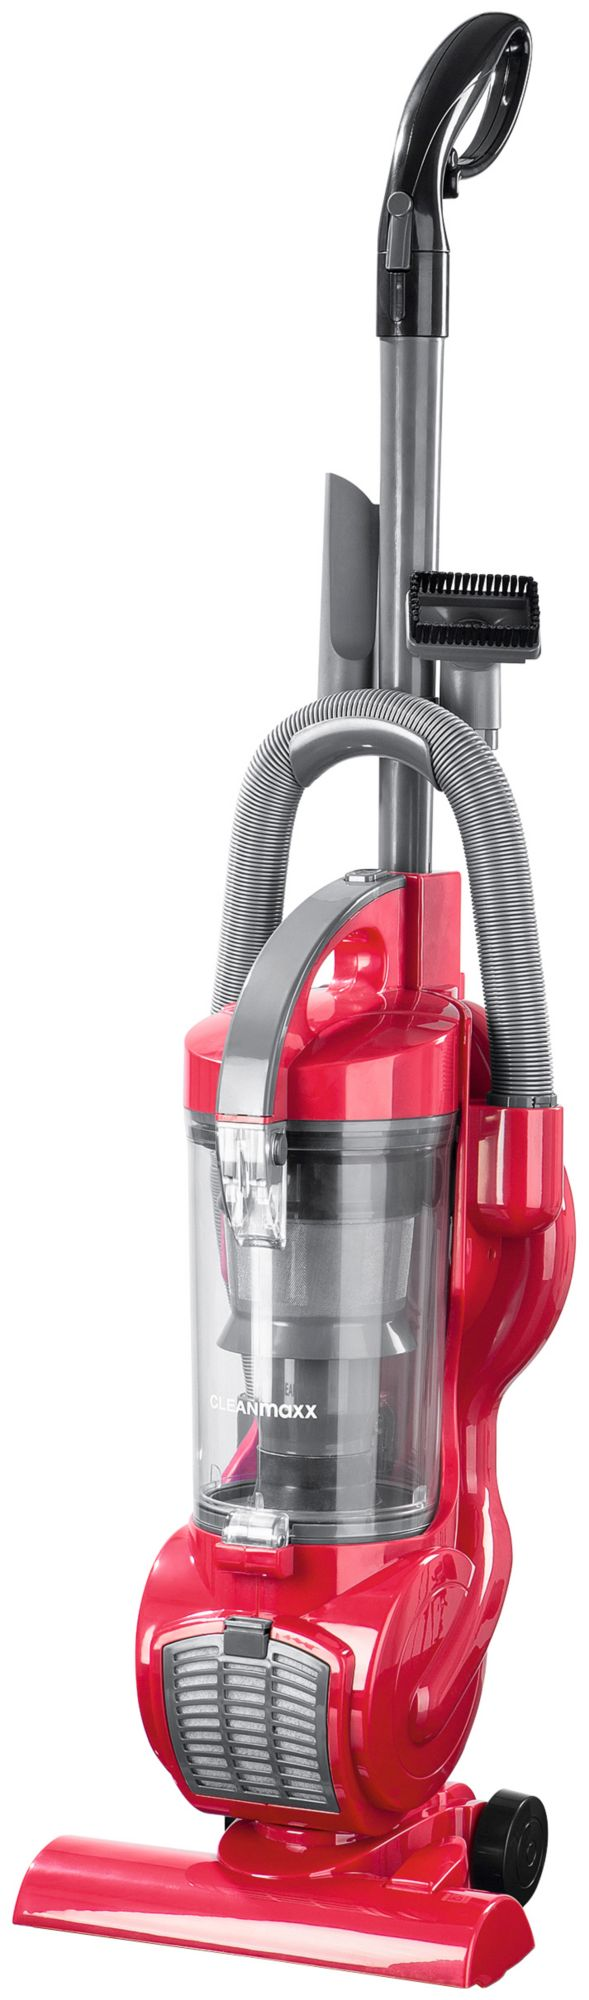 CLEAN MAXX CLEANmaxx Zyklon-Staubsauger »800 W-FJ142L«, mit HEPA-Filtersystem